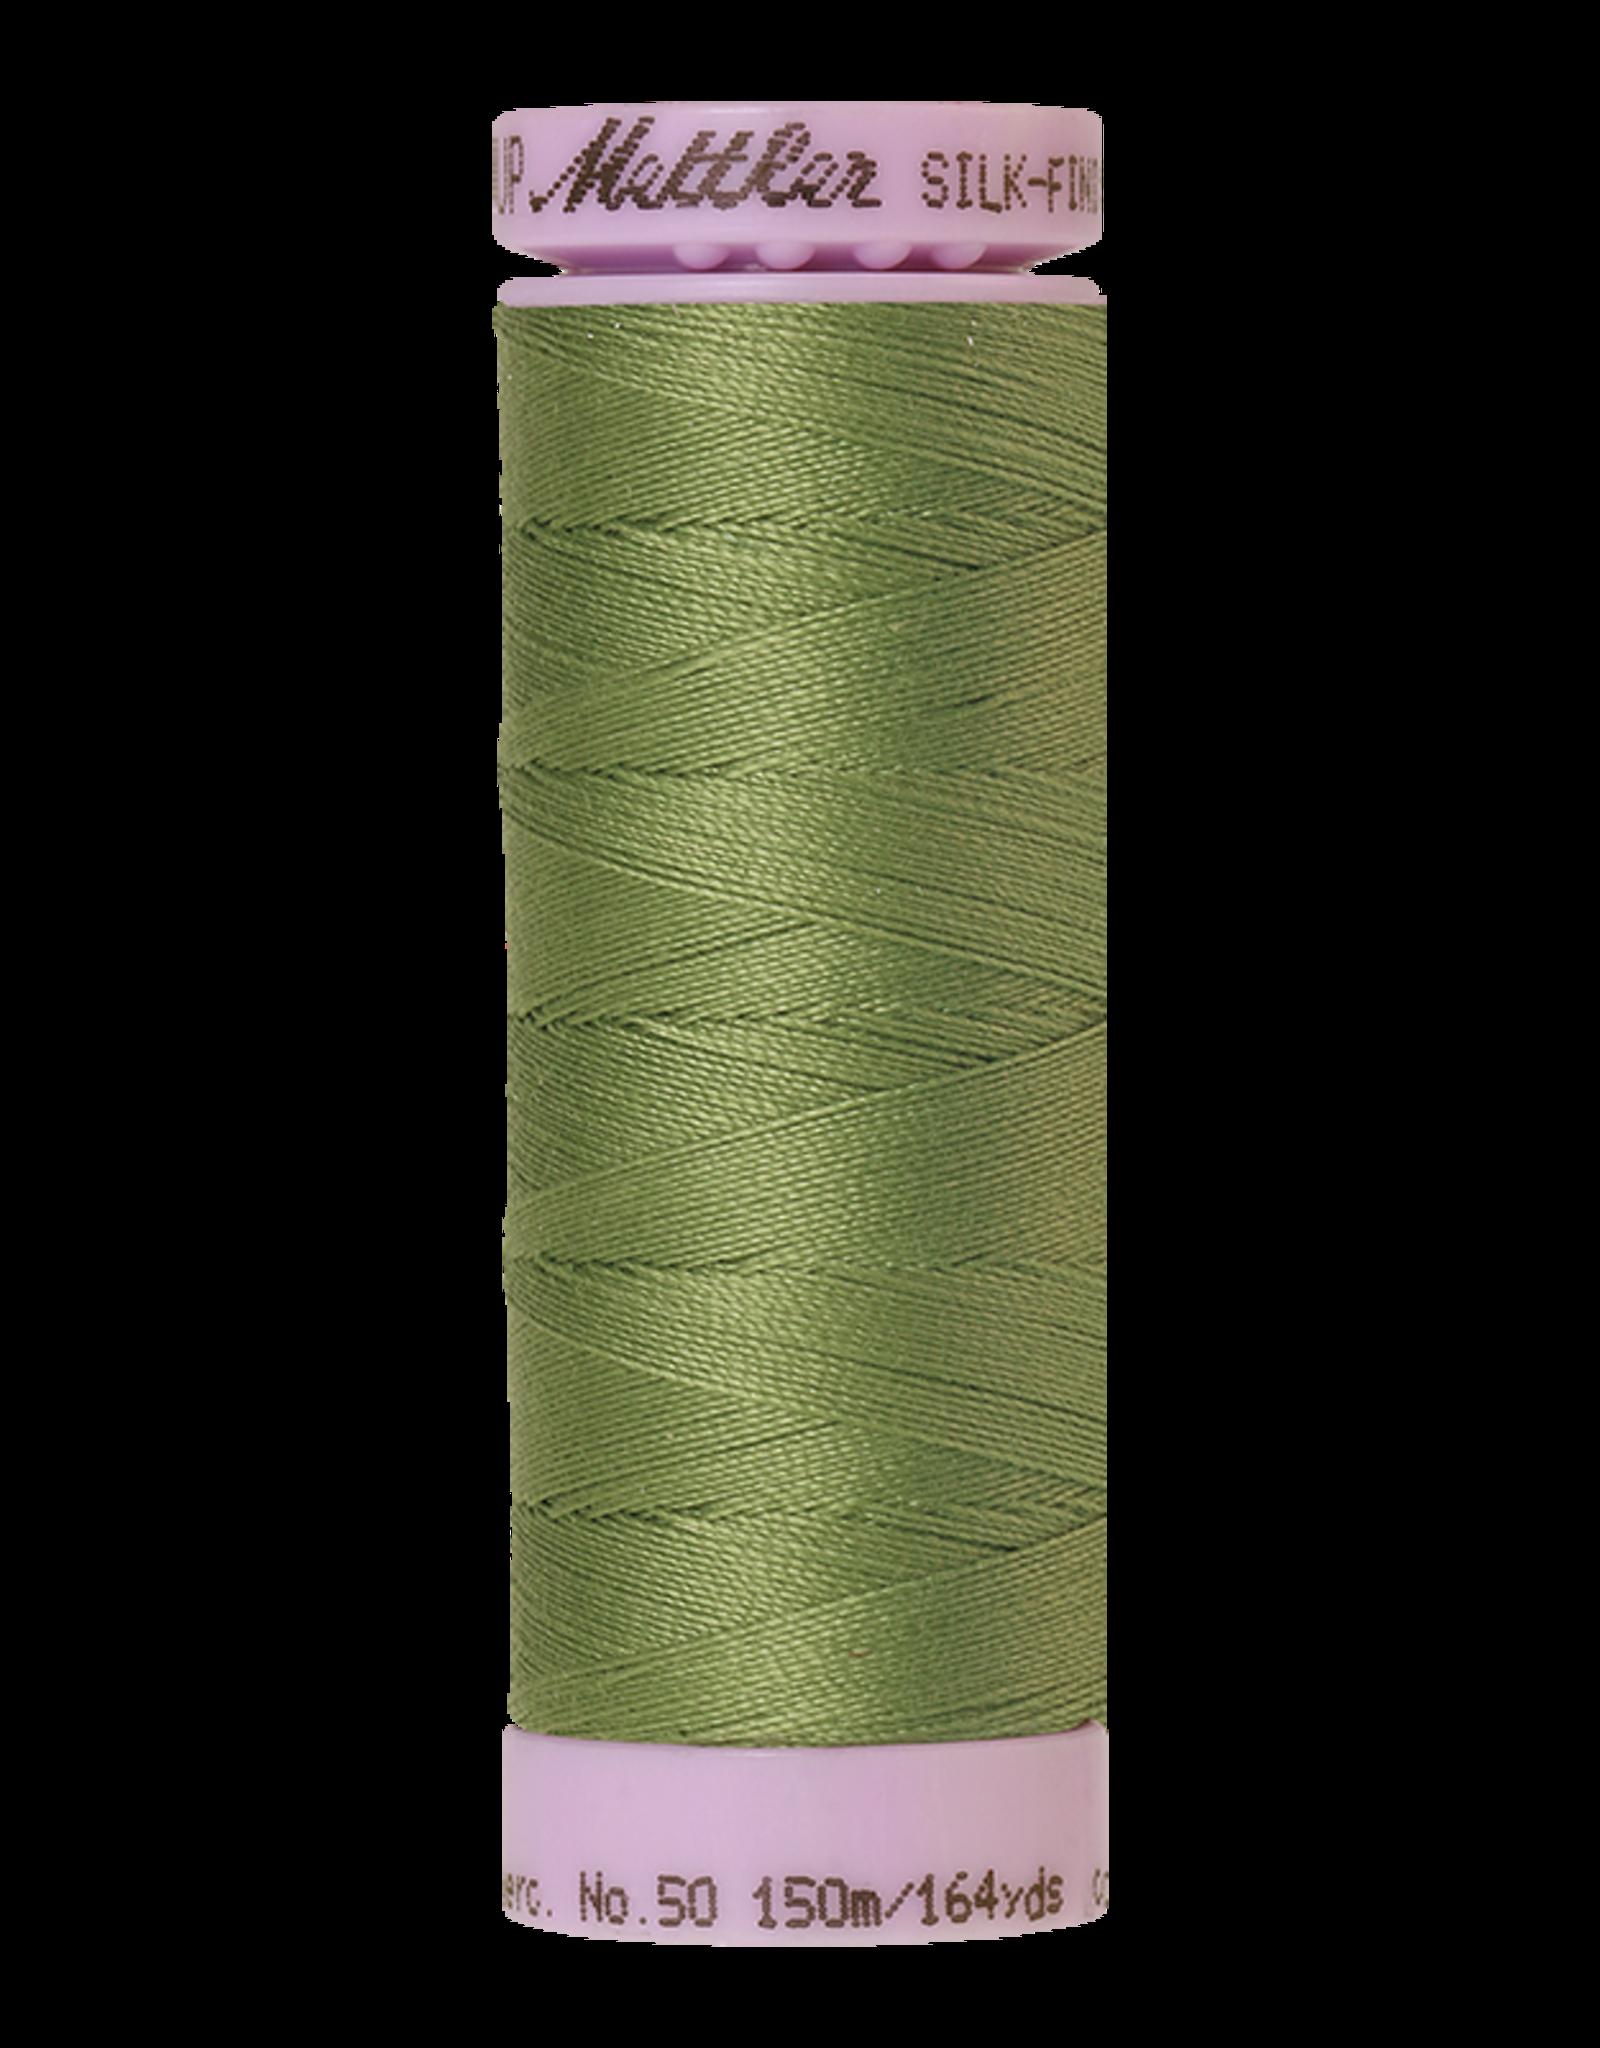 Mettler Silk Finish Cotton 50 - 150 meter - 0840